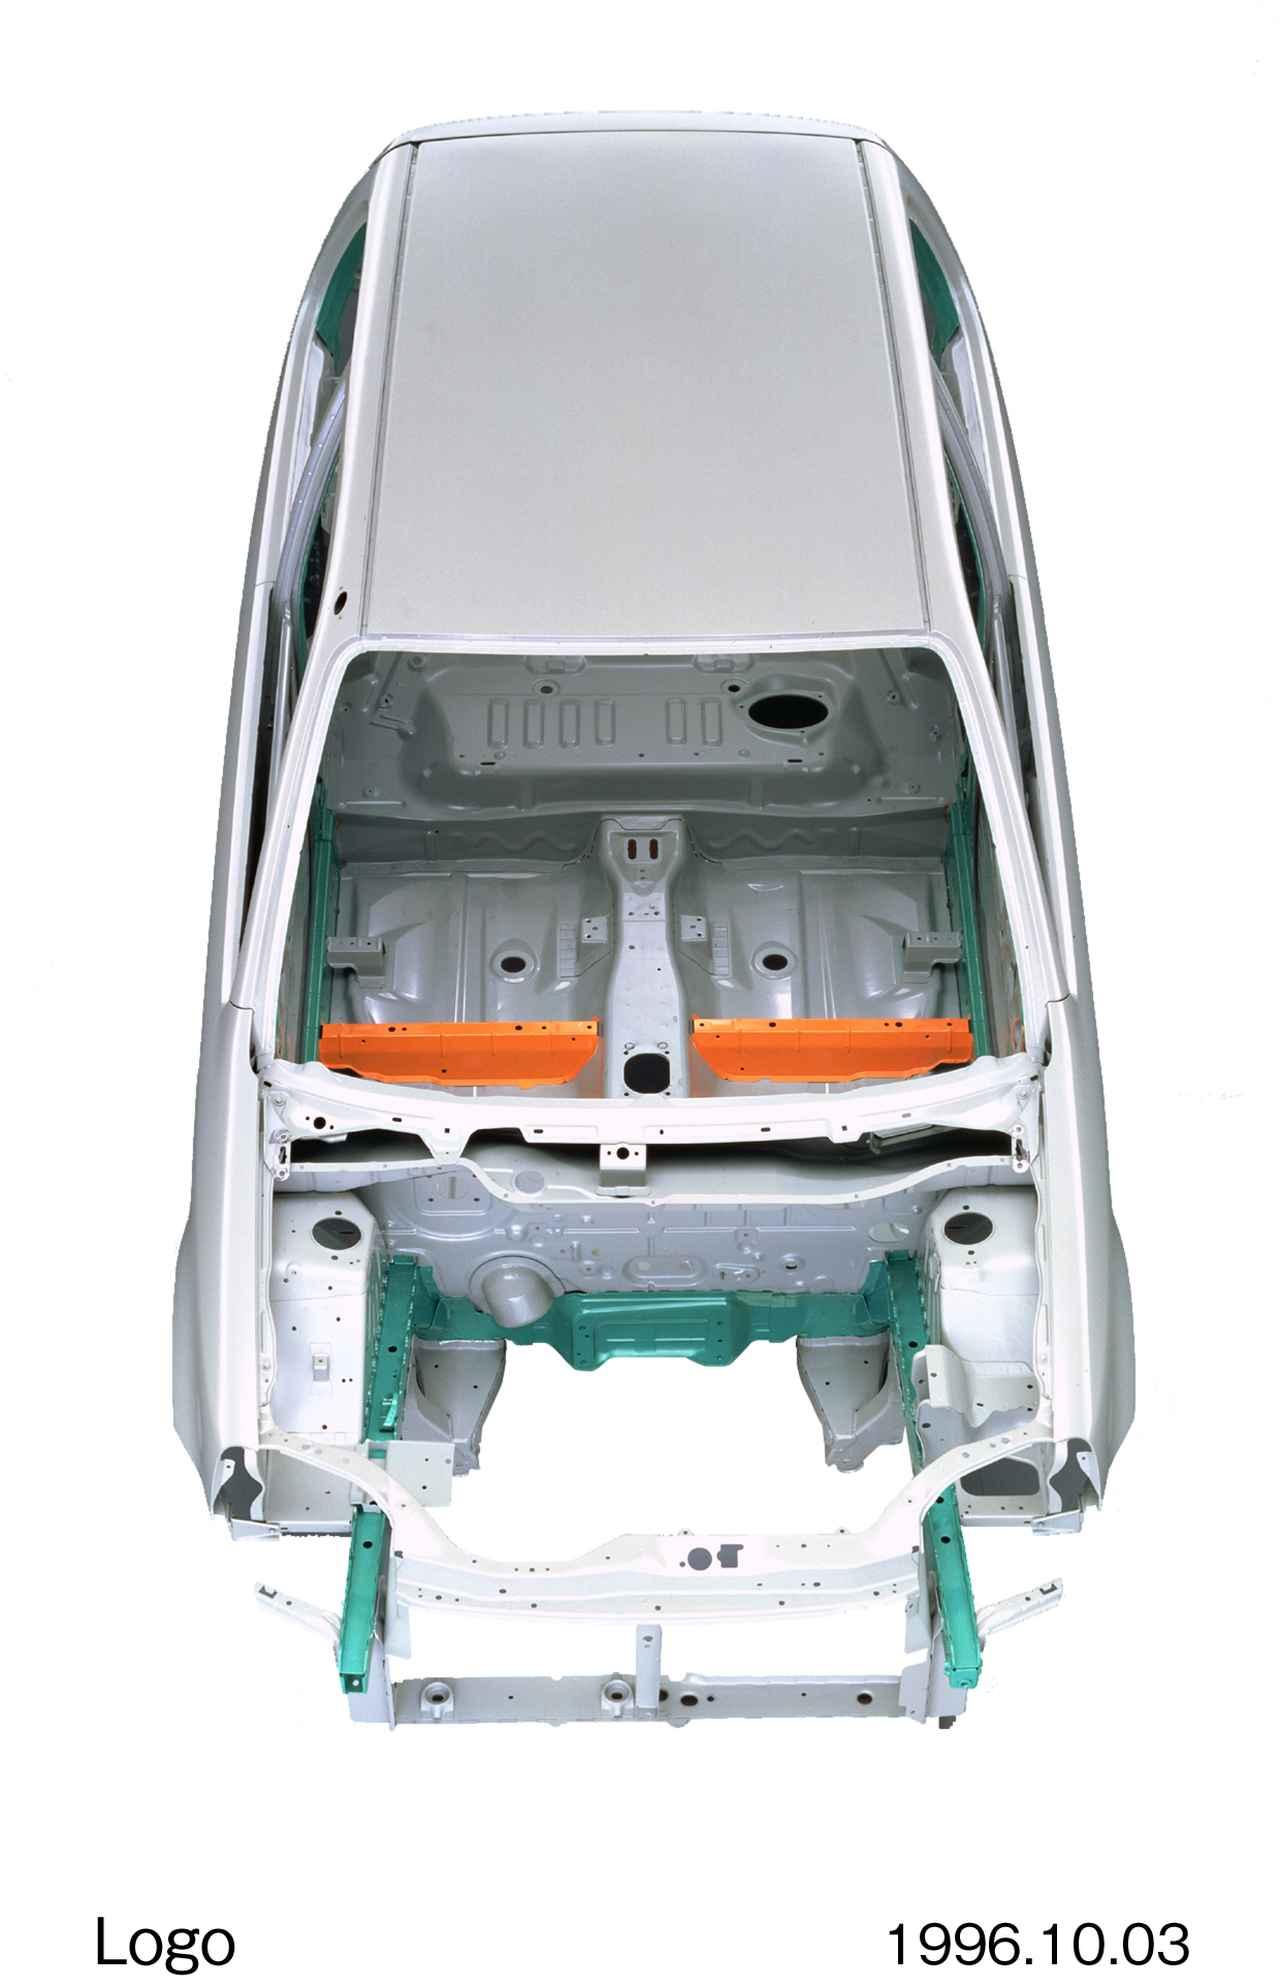 Images : 6番目の画像 - ホンダロゴ関連の画像はこちら(クリックして拡大) - A Little Honda | ア・リトル・ホンダ(リトホン)